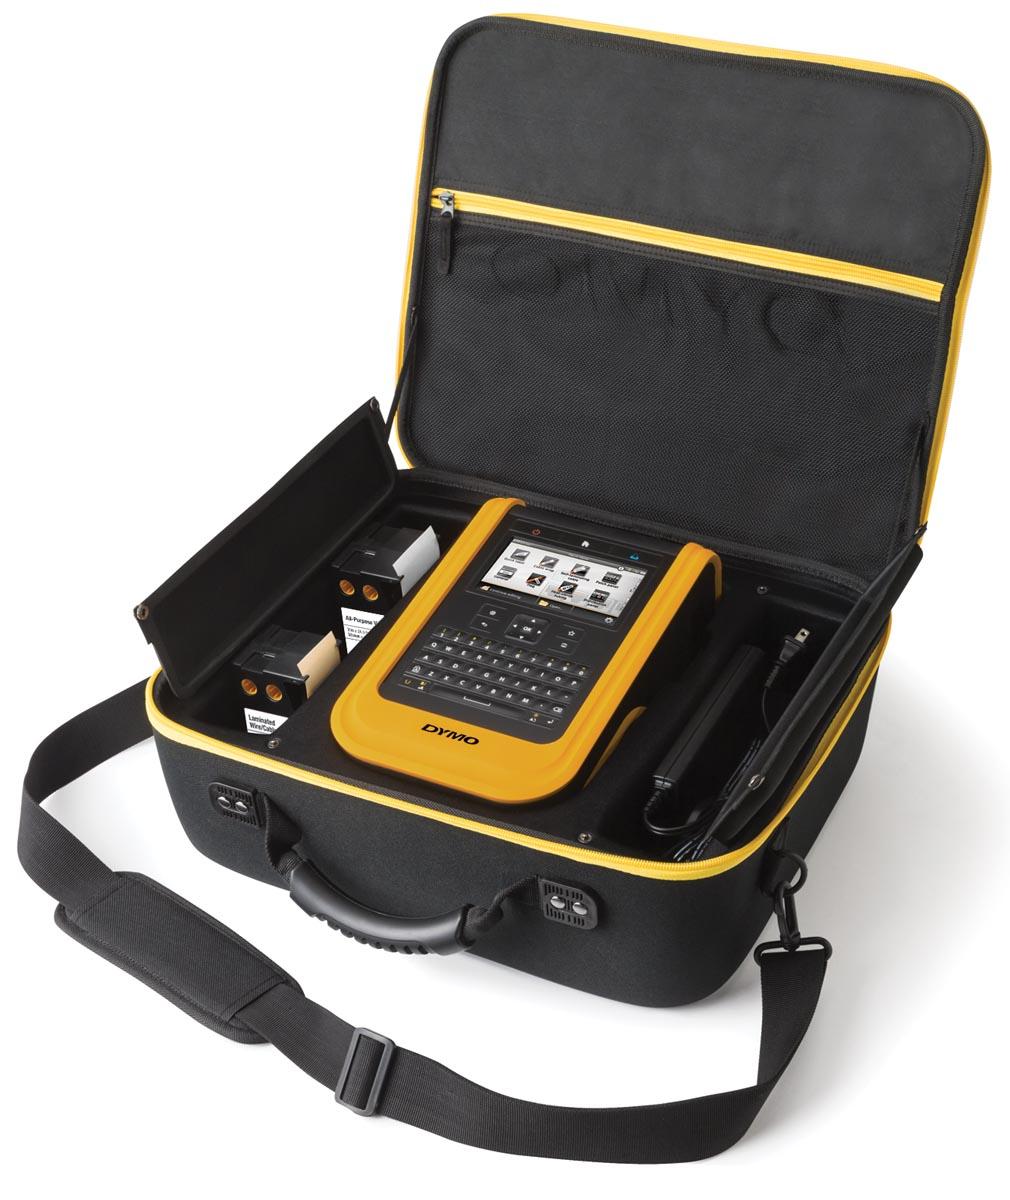 Dymo beletteringsysteem XTL 500 kit, 54 mm, qwerty